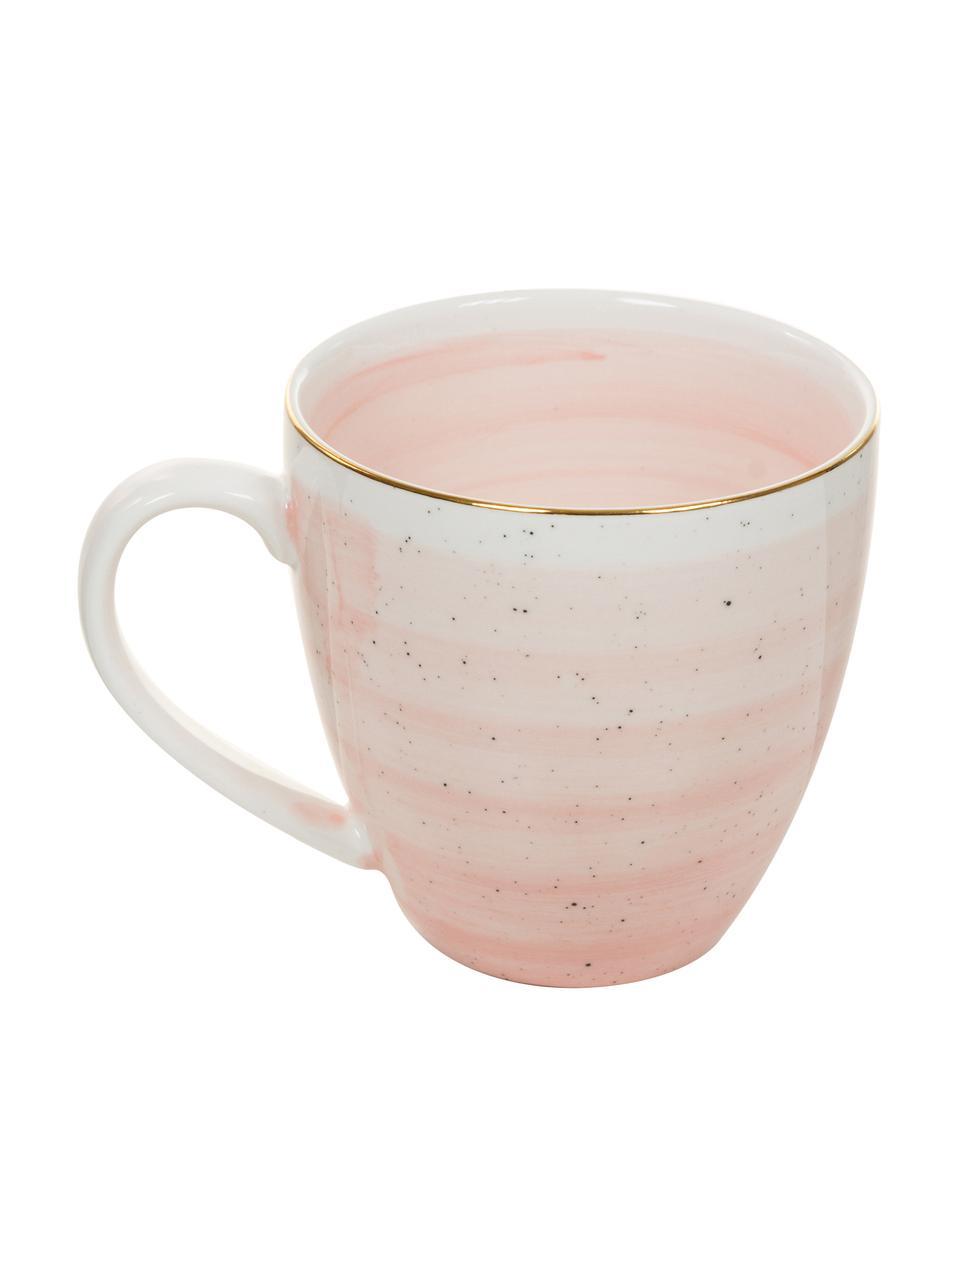 Handgemachte Kaffeetassen Bella mit Goldrand, 2 Stück, Porzellan, Rosa, Ø 9 x H 9 cm